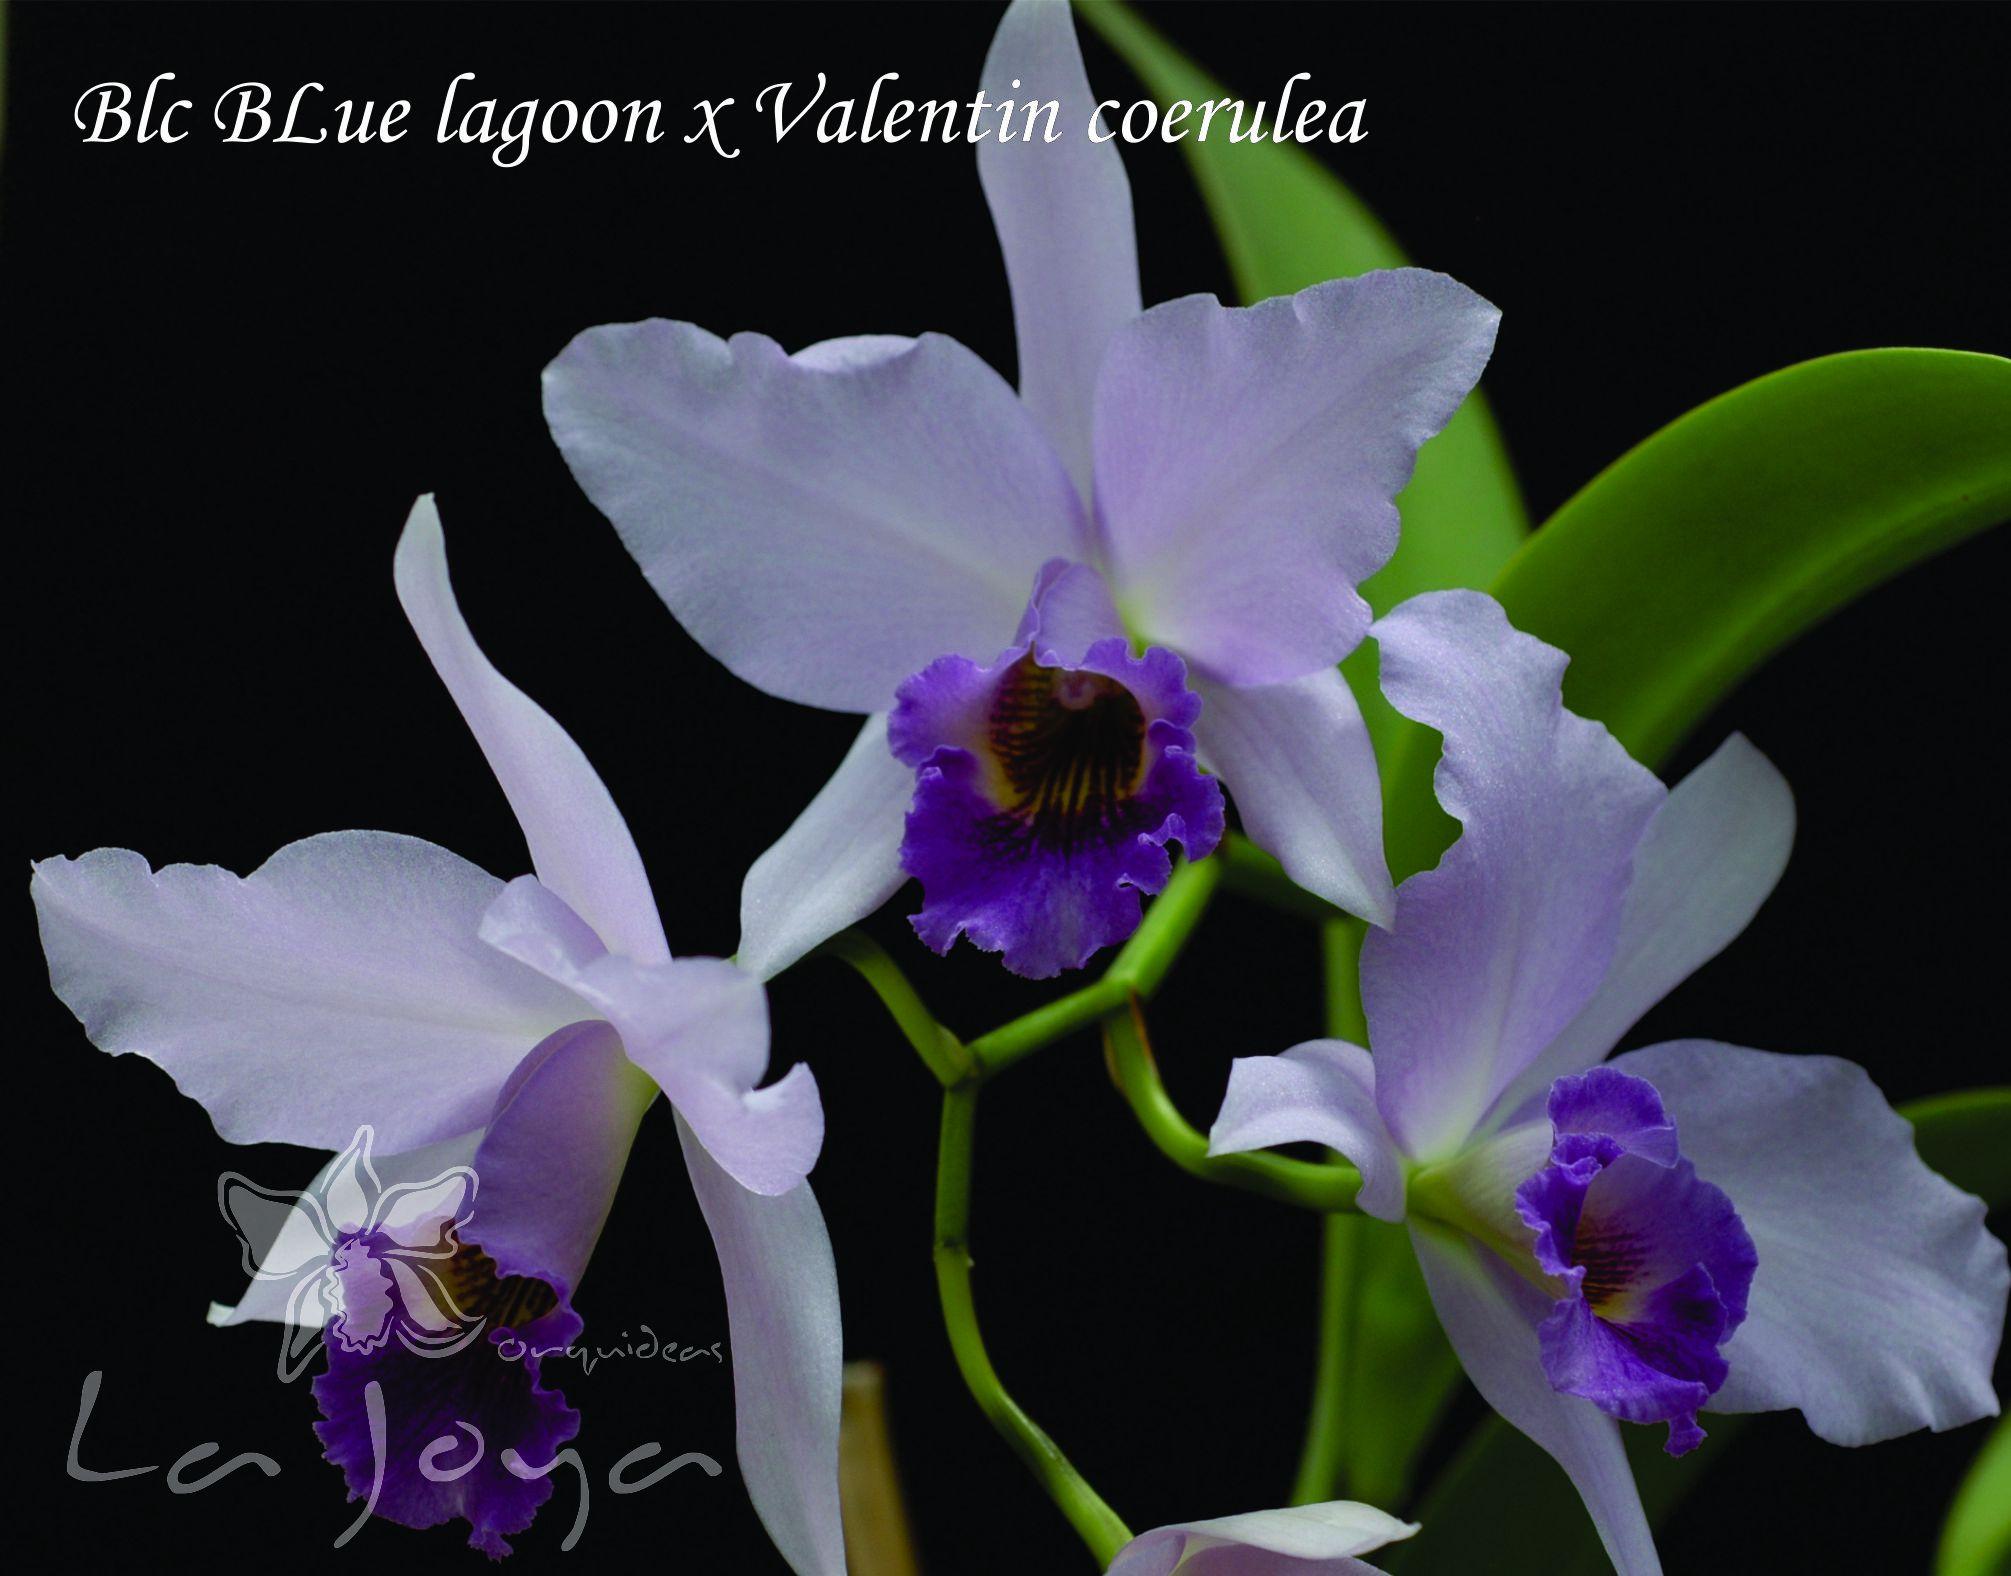 Blc. Blue Lagoon x Valentyn Coerulea